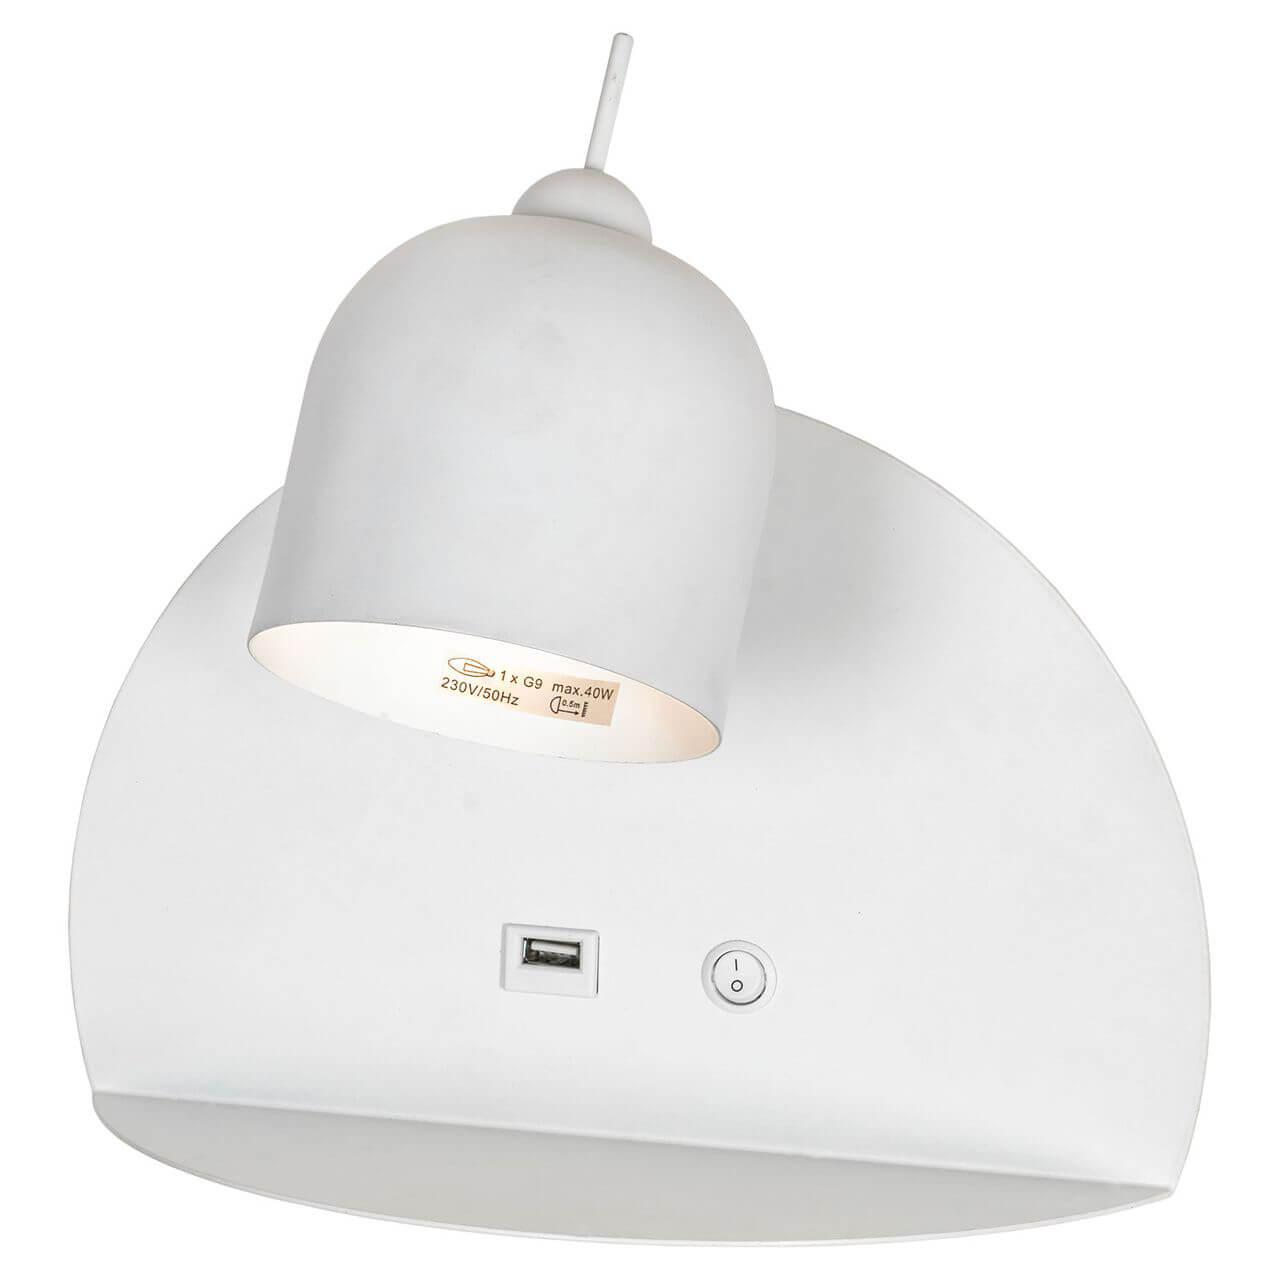 Спот Lussole GRLSP-8233 Cozy (USB зарядное устройство)